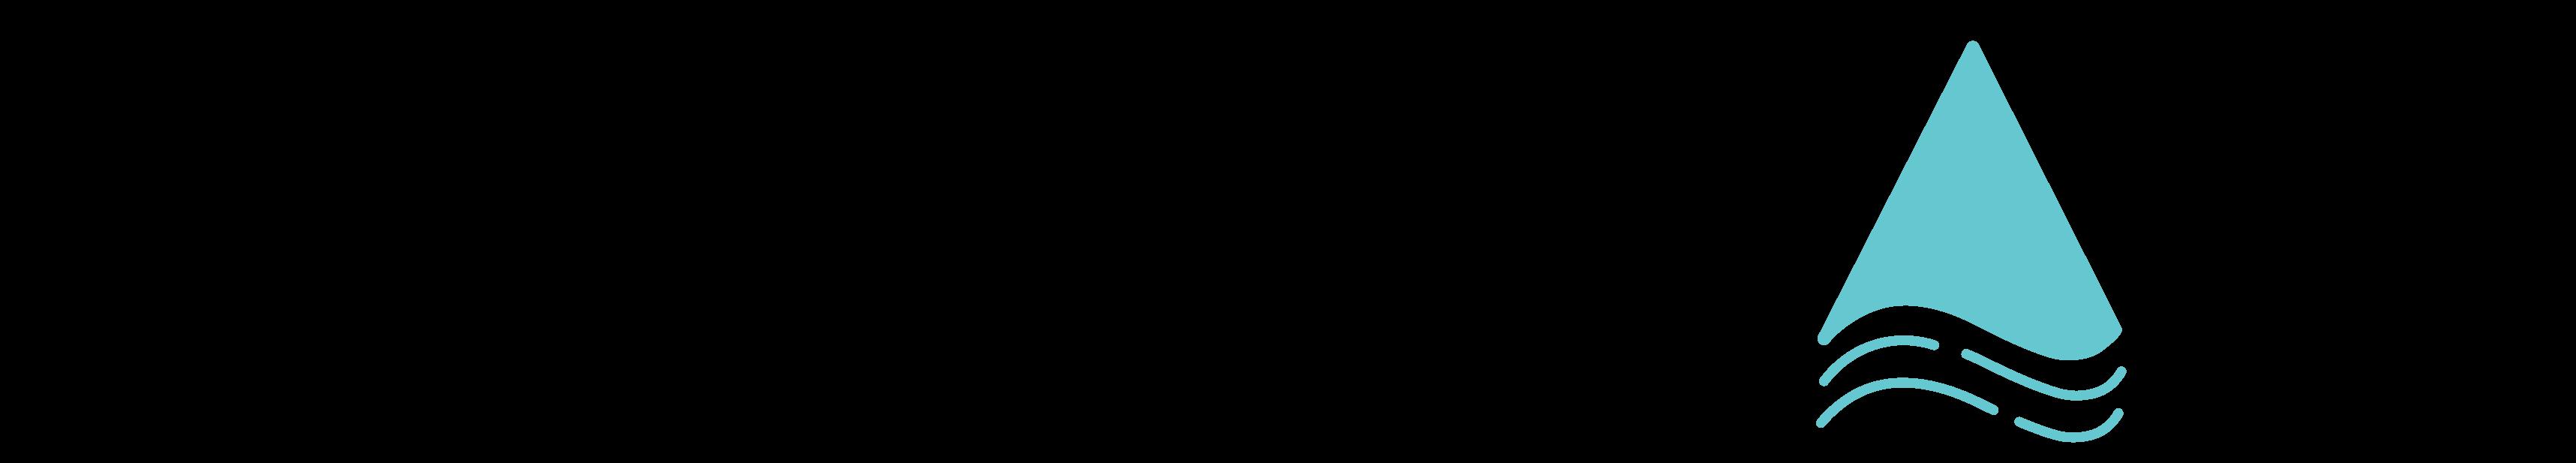 Potestiam logo